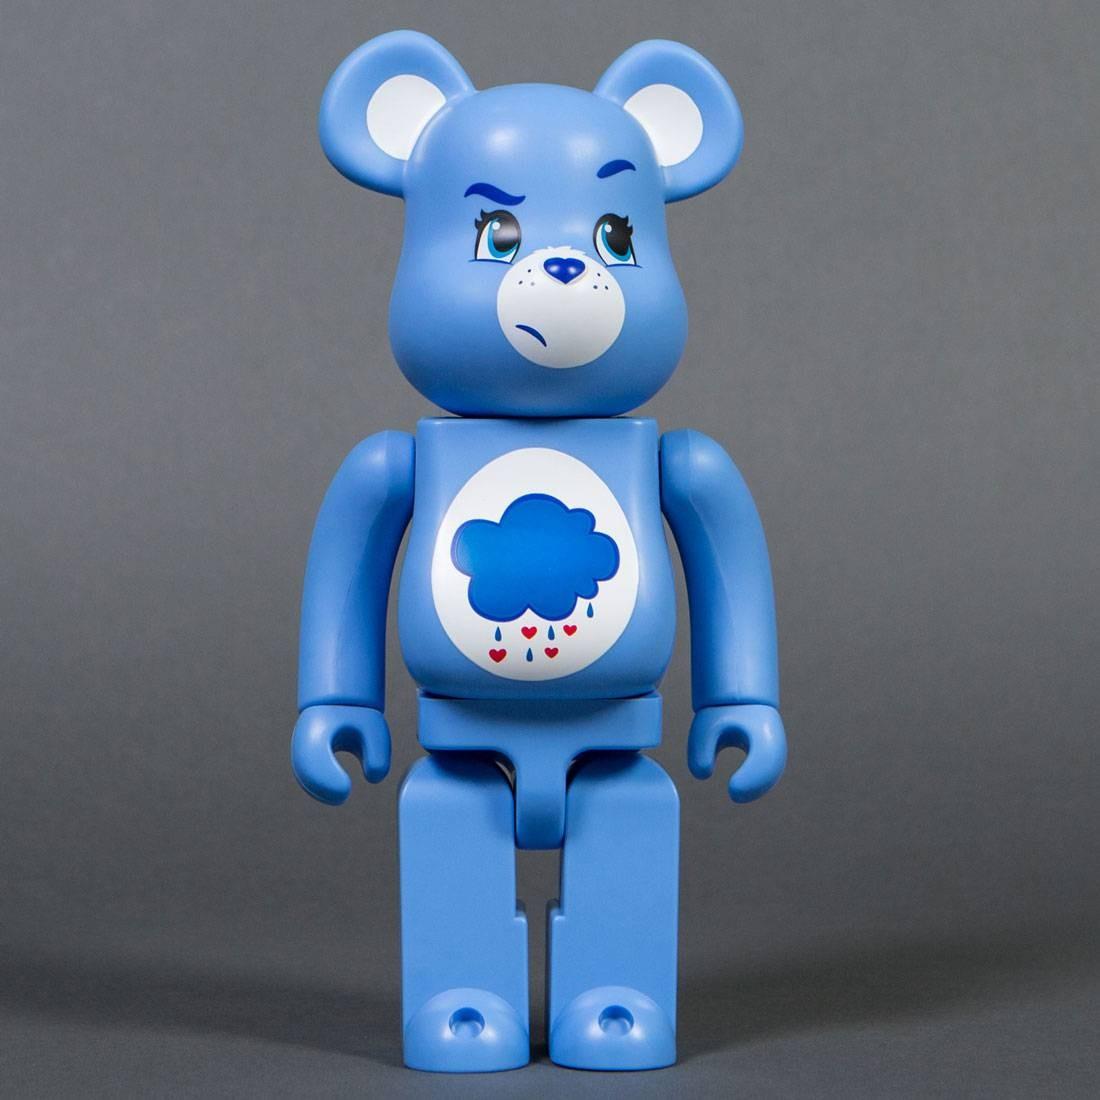 Medicom Care Bears Grumpy Bear 400% Bearbrick Figure blue